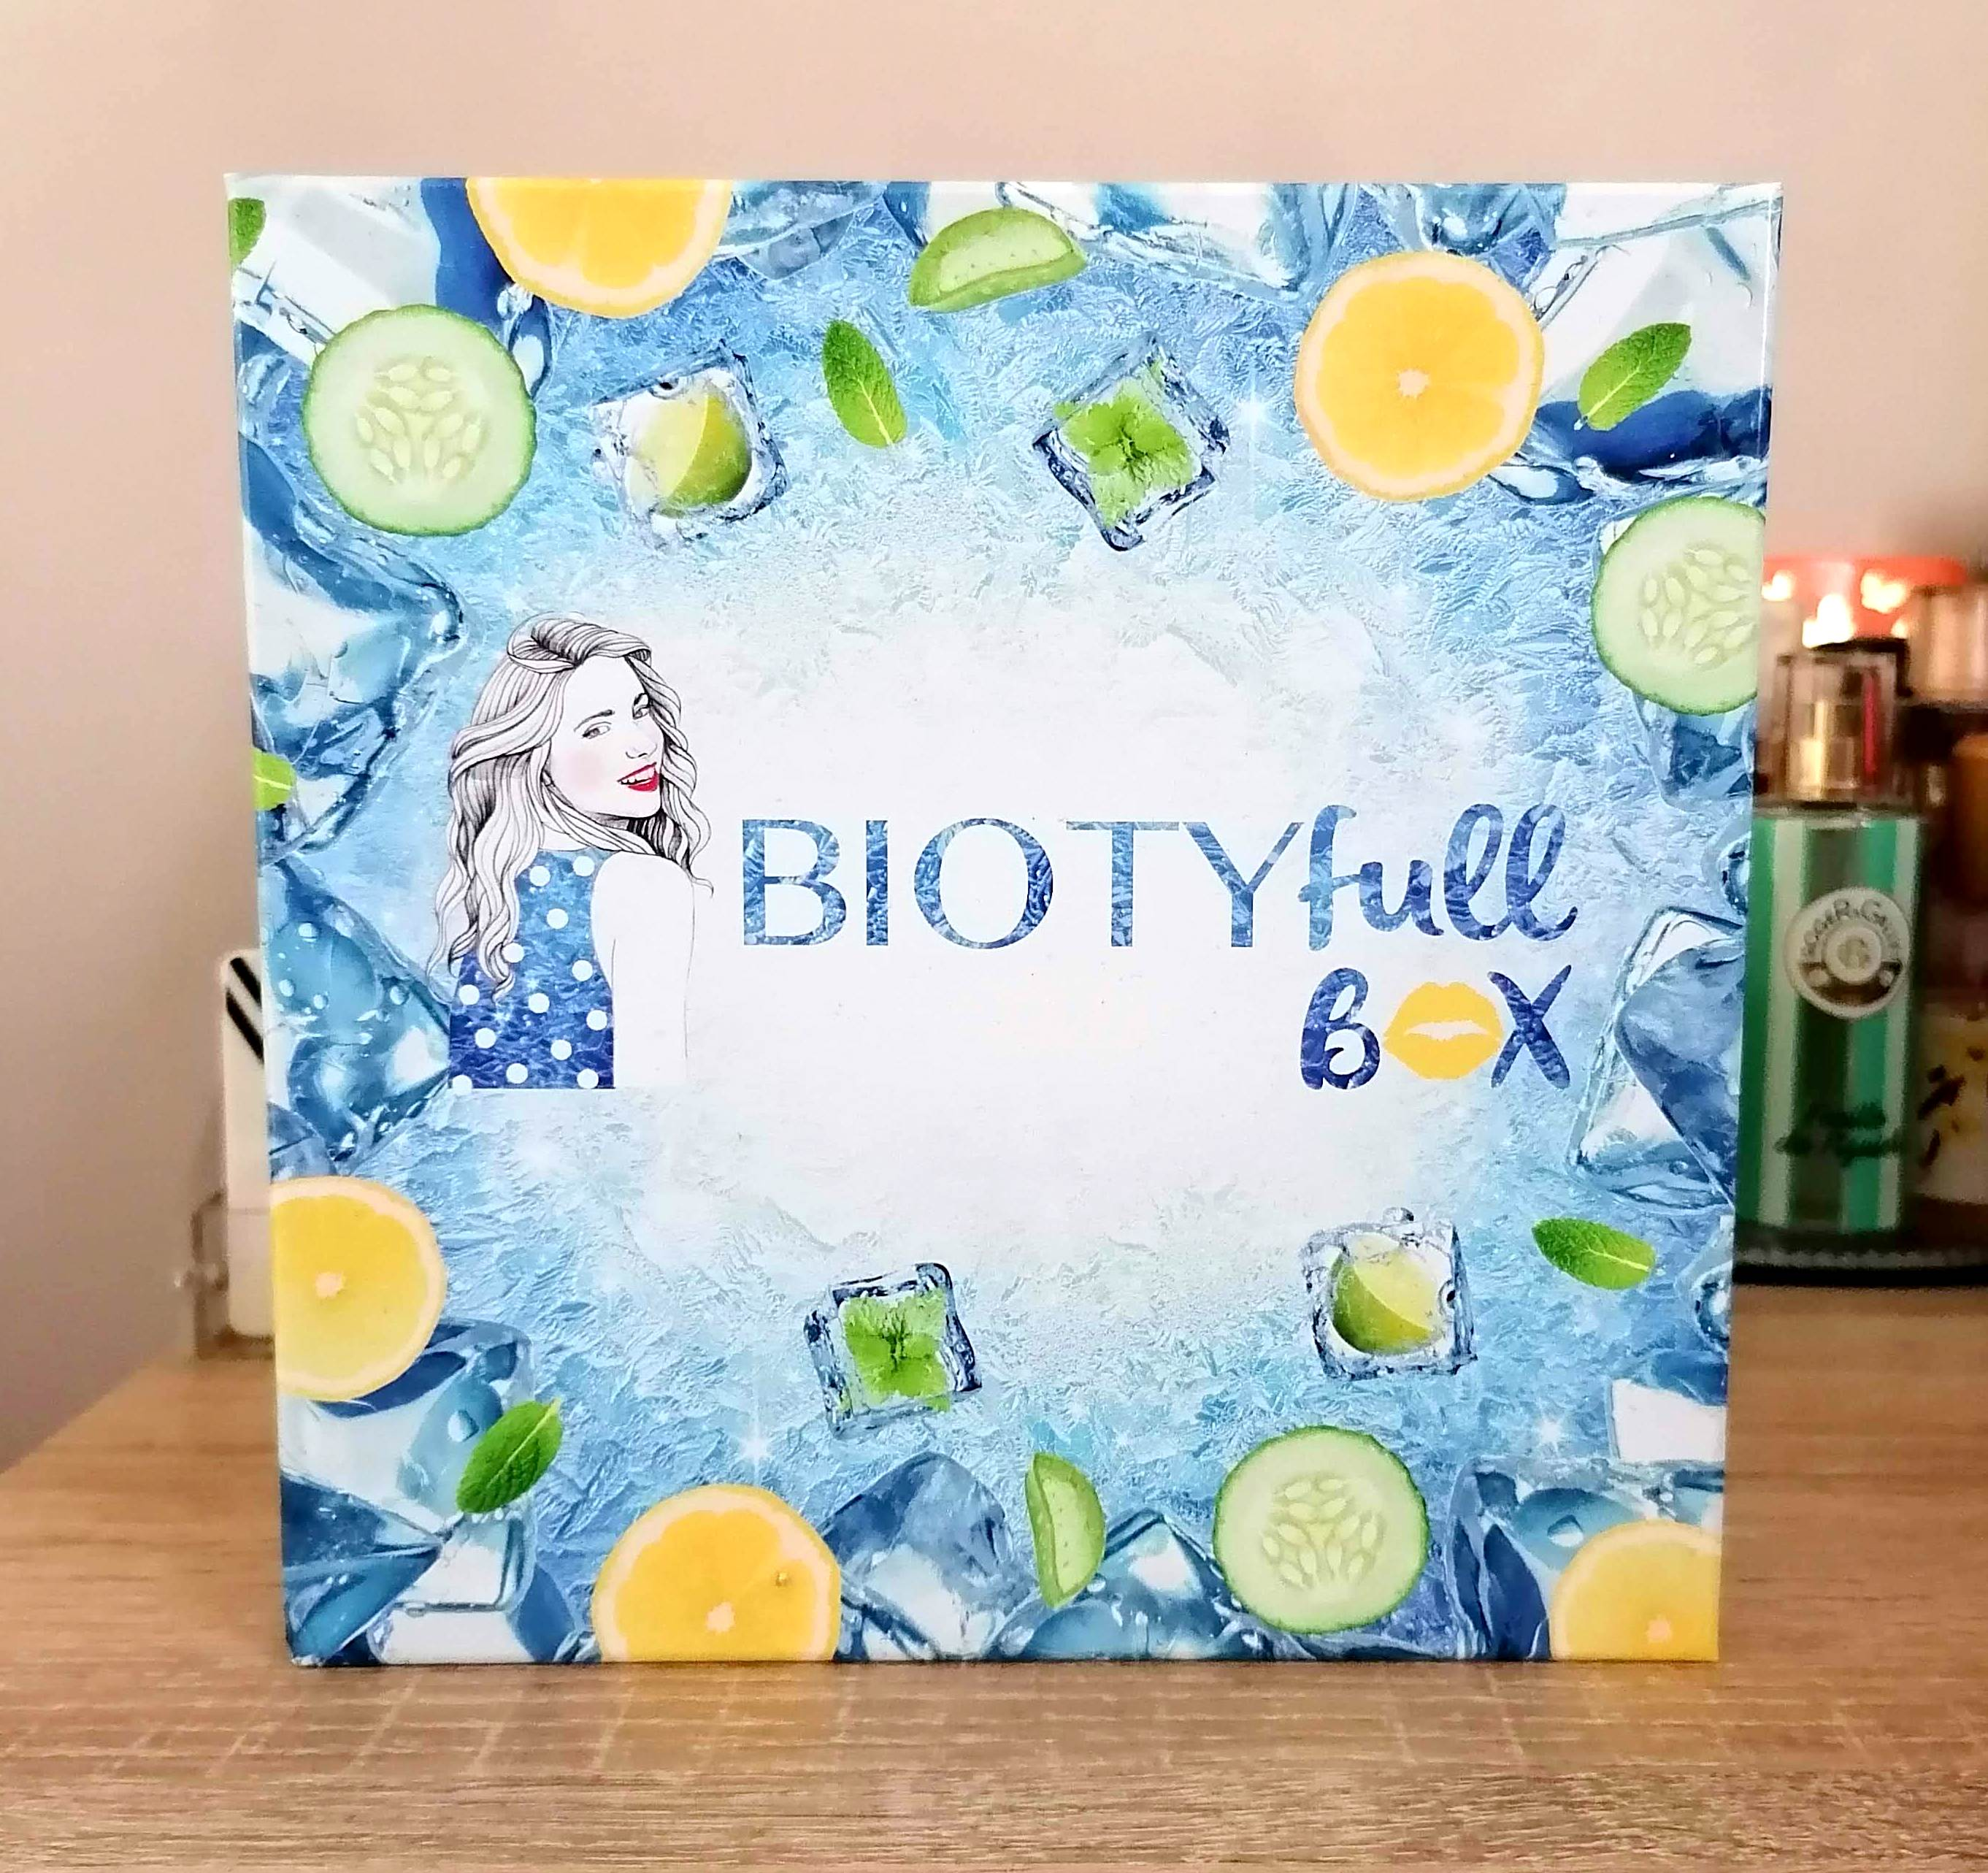 BIOTYfull Box Juin 2020 : La gelifiée!